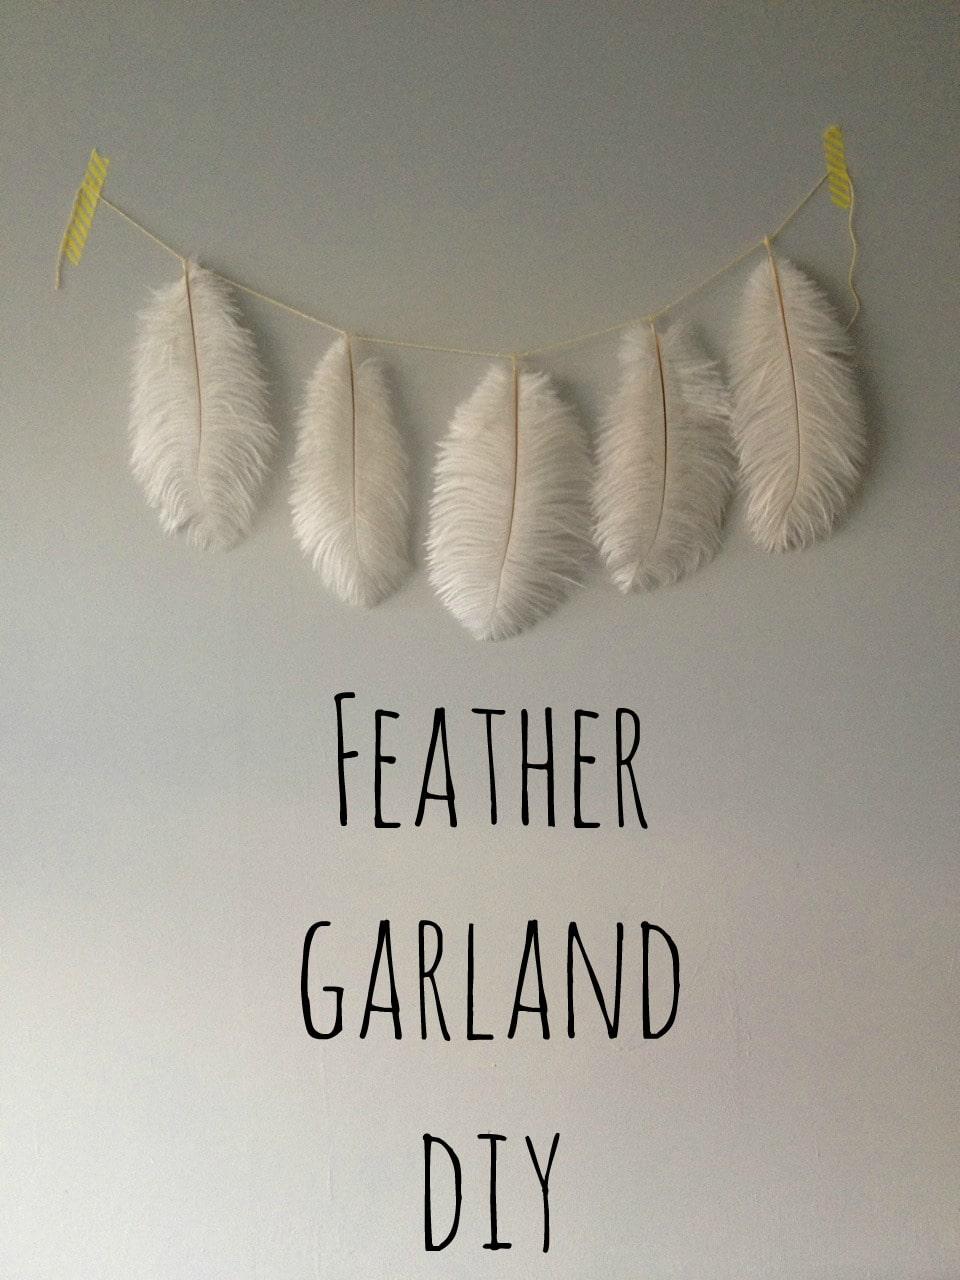 Feather garland DIY